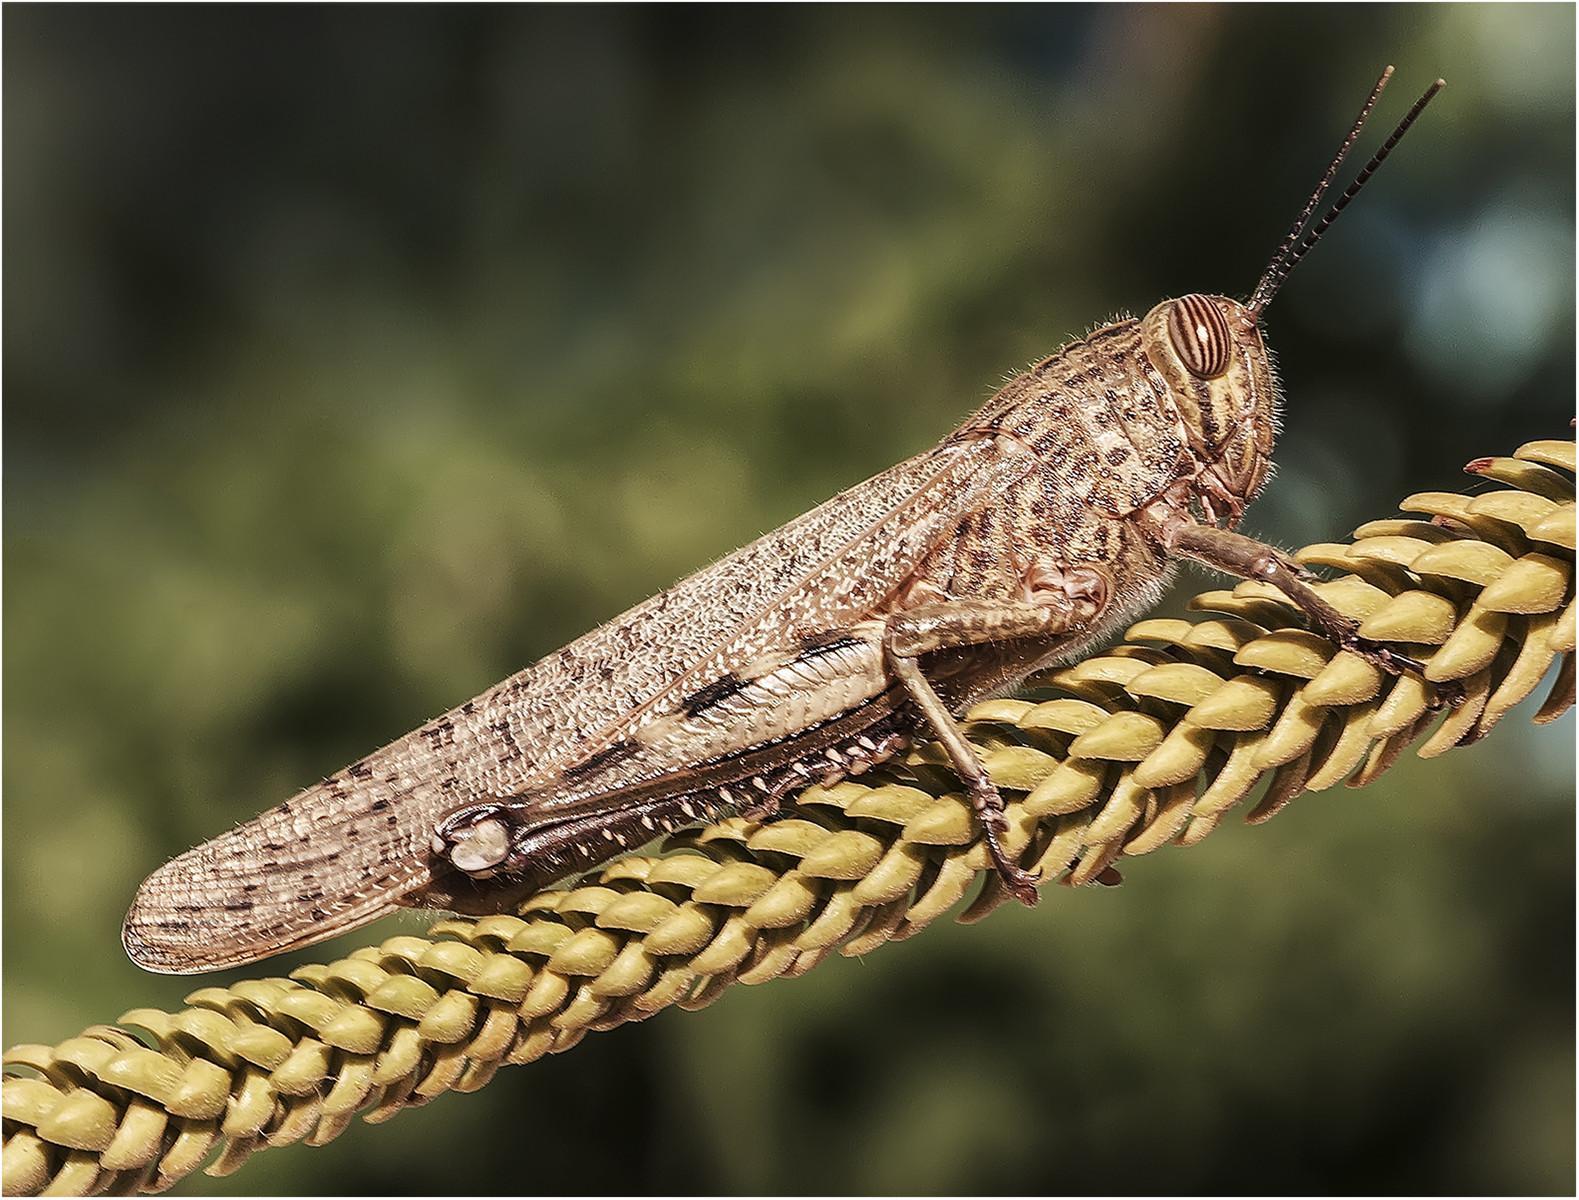 PDI - Locust by Stephen McWilliams (10 marks)